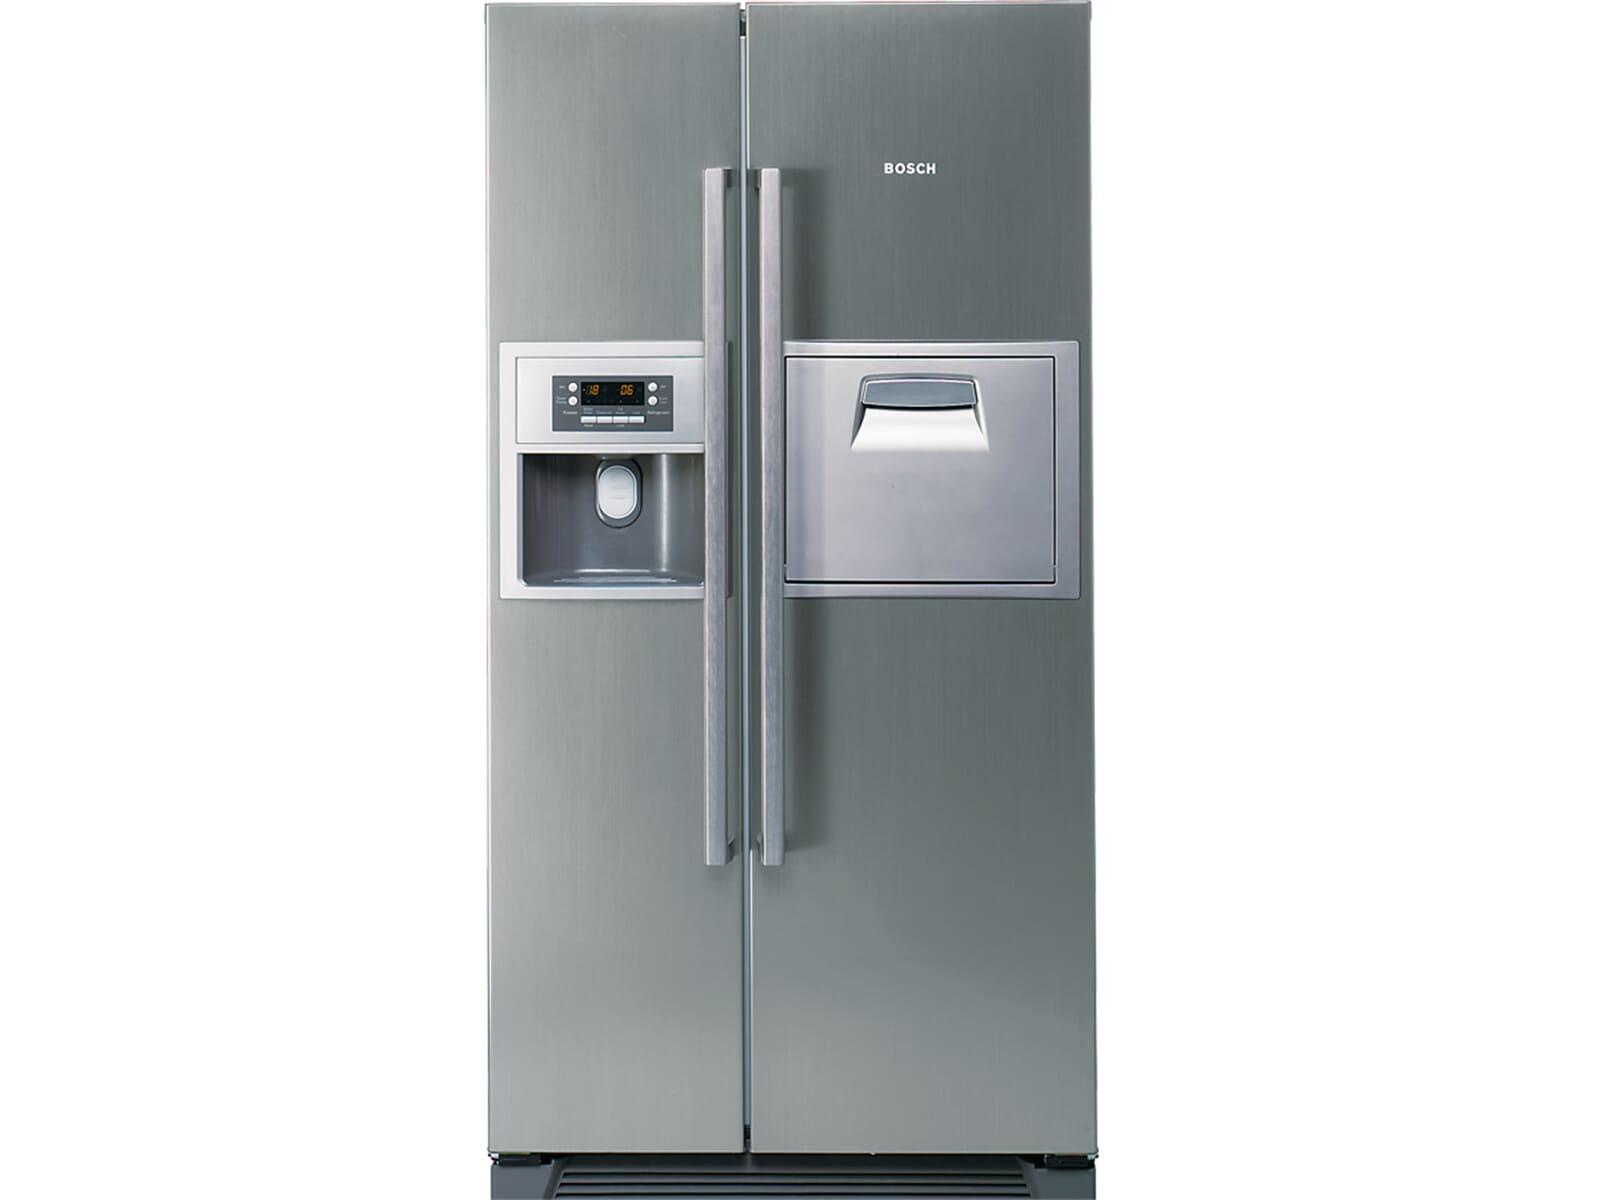 Gorenje Kühlschrank Erfahrungen : Kühlschrank einstellen kühlschrank gorenje bewertung tommie r